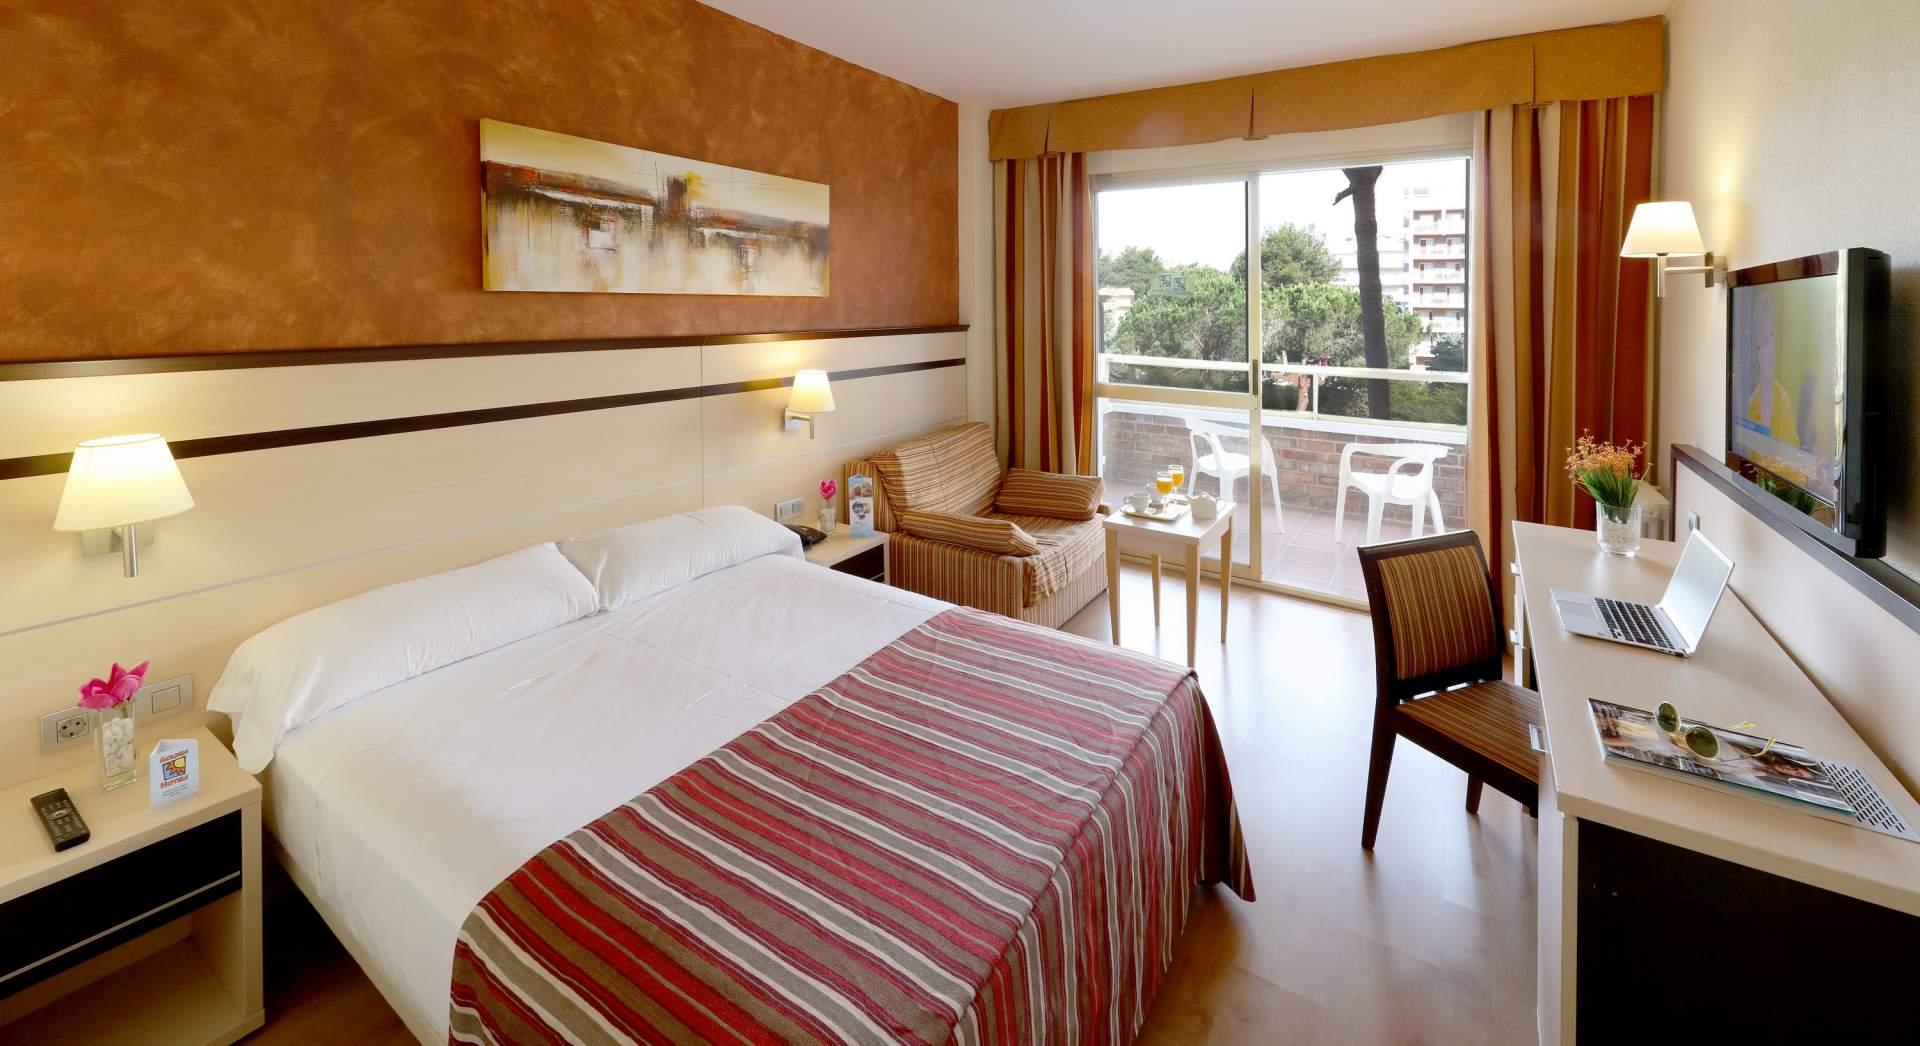 Busreis Fietsreis voor wielertoeristen Salou Hotel Golden Port Salou